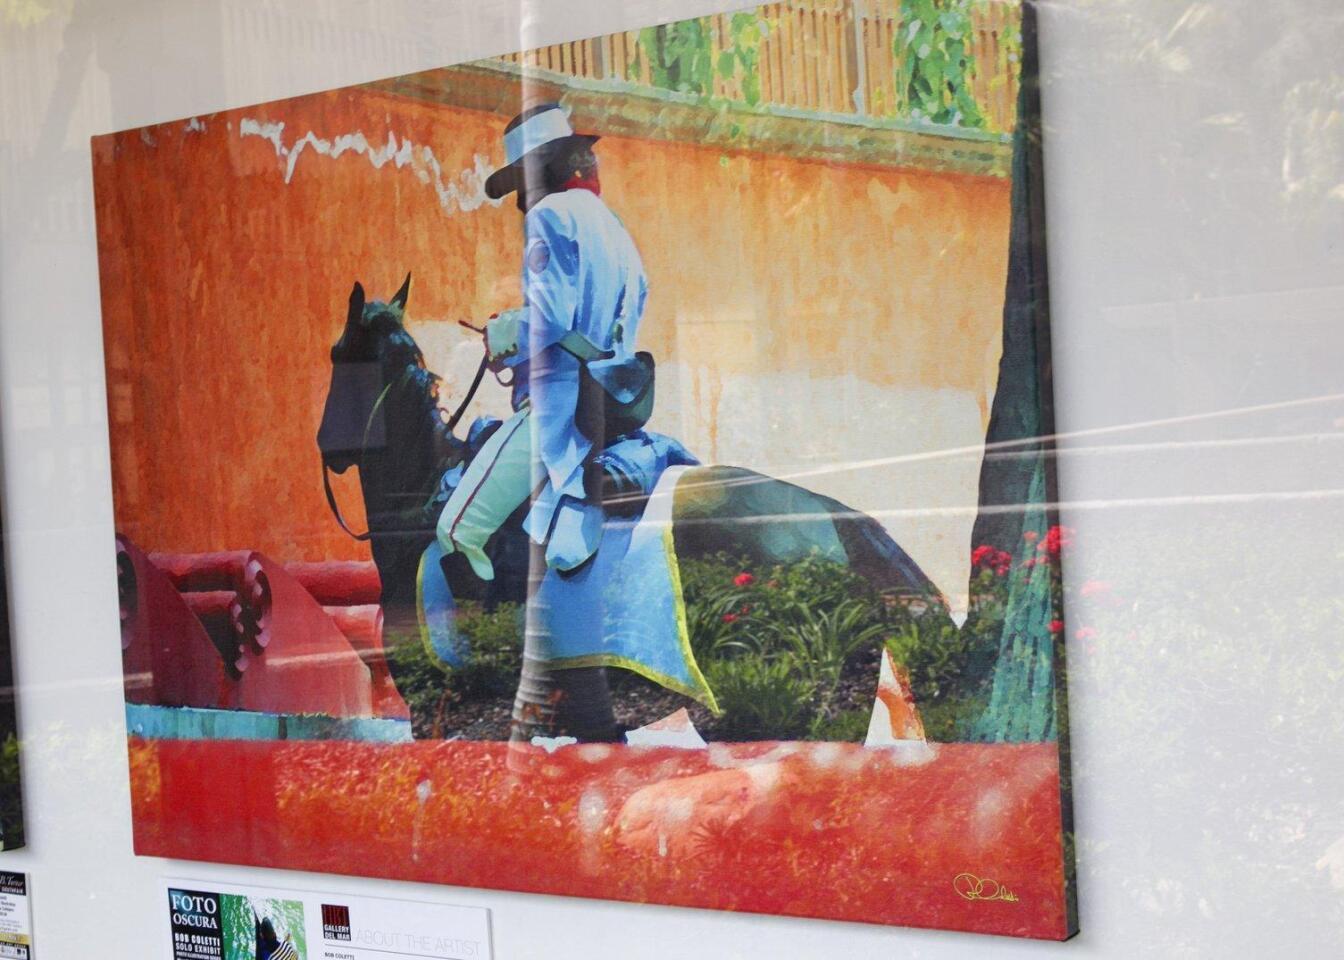 """Cevallo Soldado"" by Bob Coletti on display at the HBT Gallery in Del Mar"